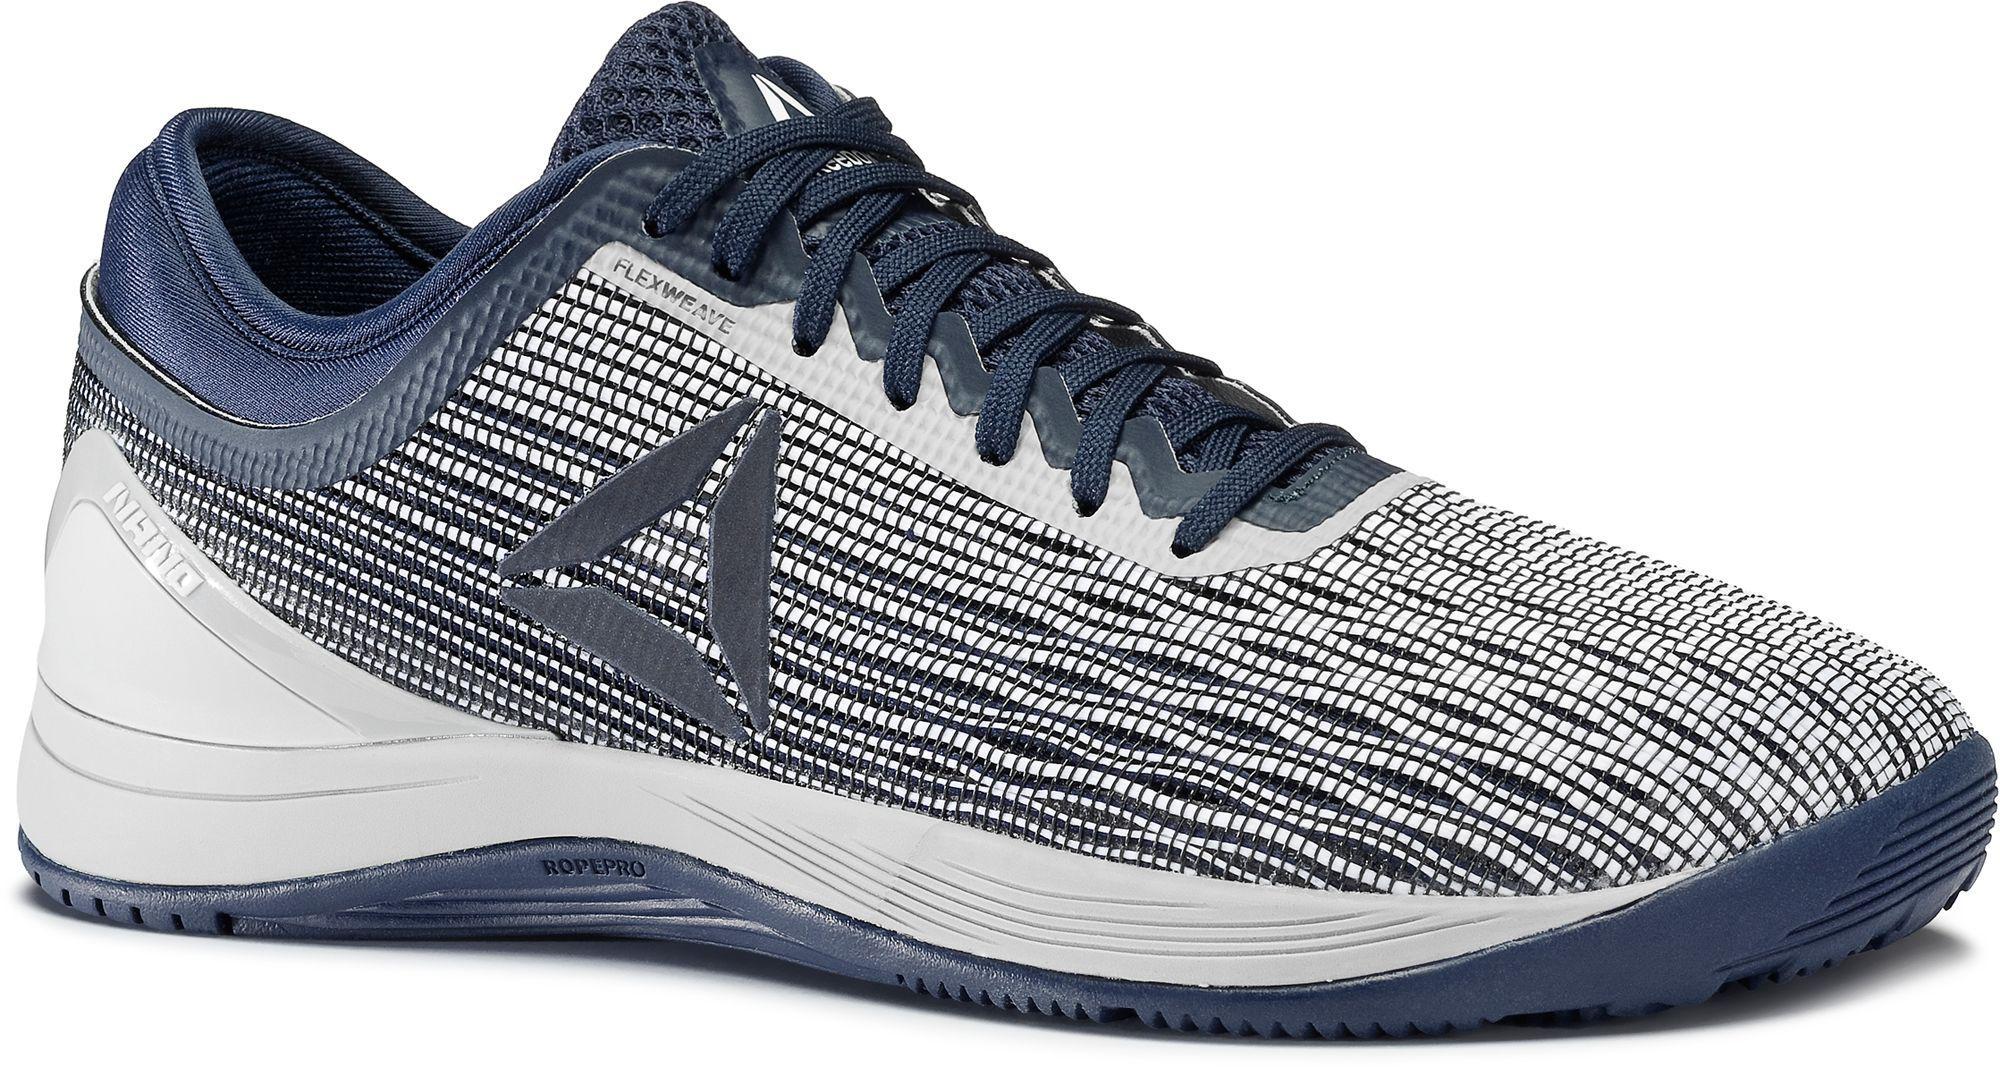 c66a9e334919 Lyst - Reebok Crossfit Nano 8.0 Flexweave Training Shoes in Blue for Men